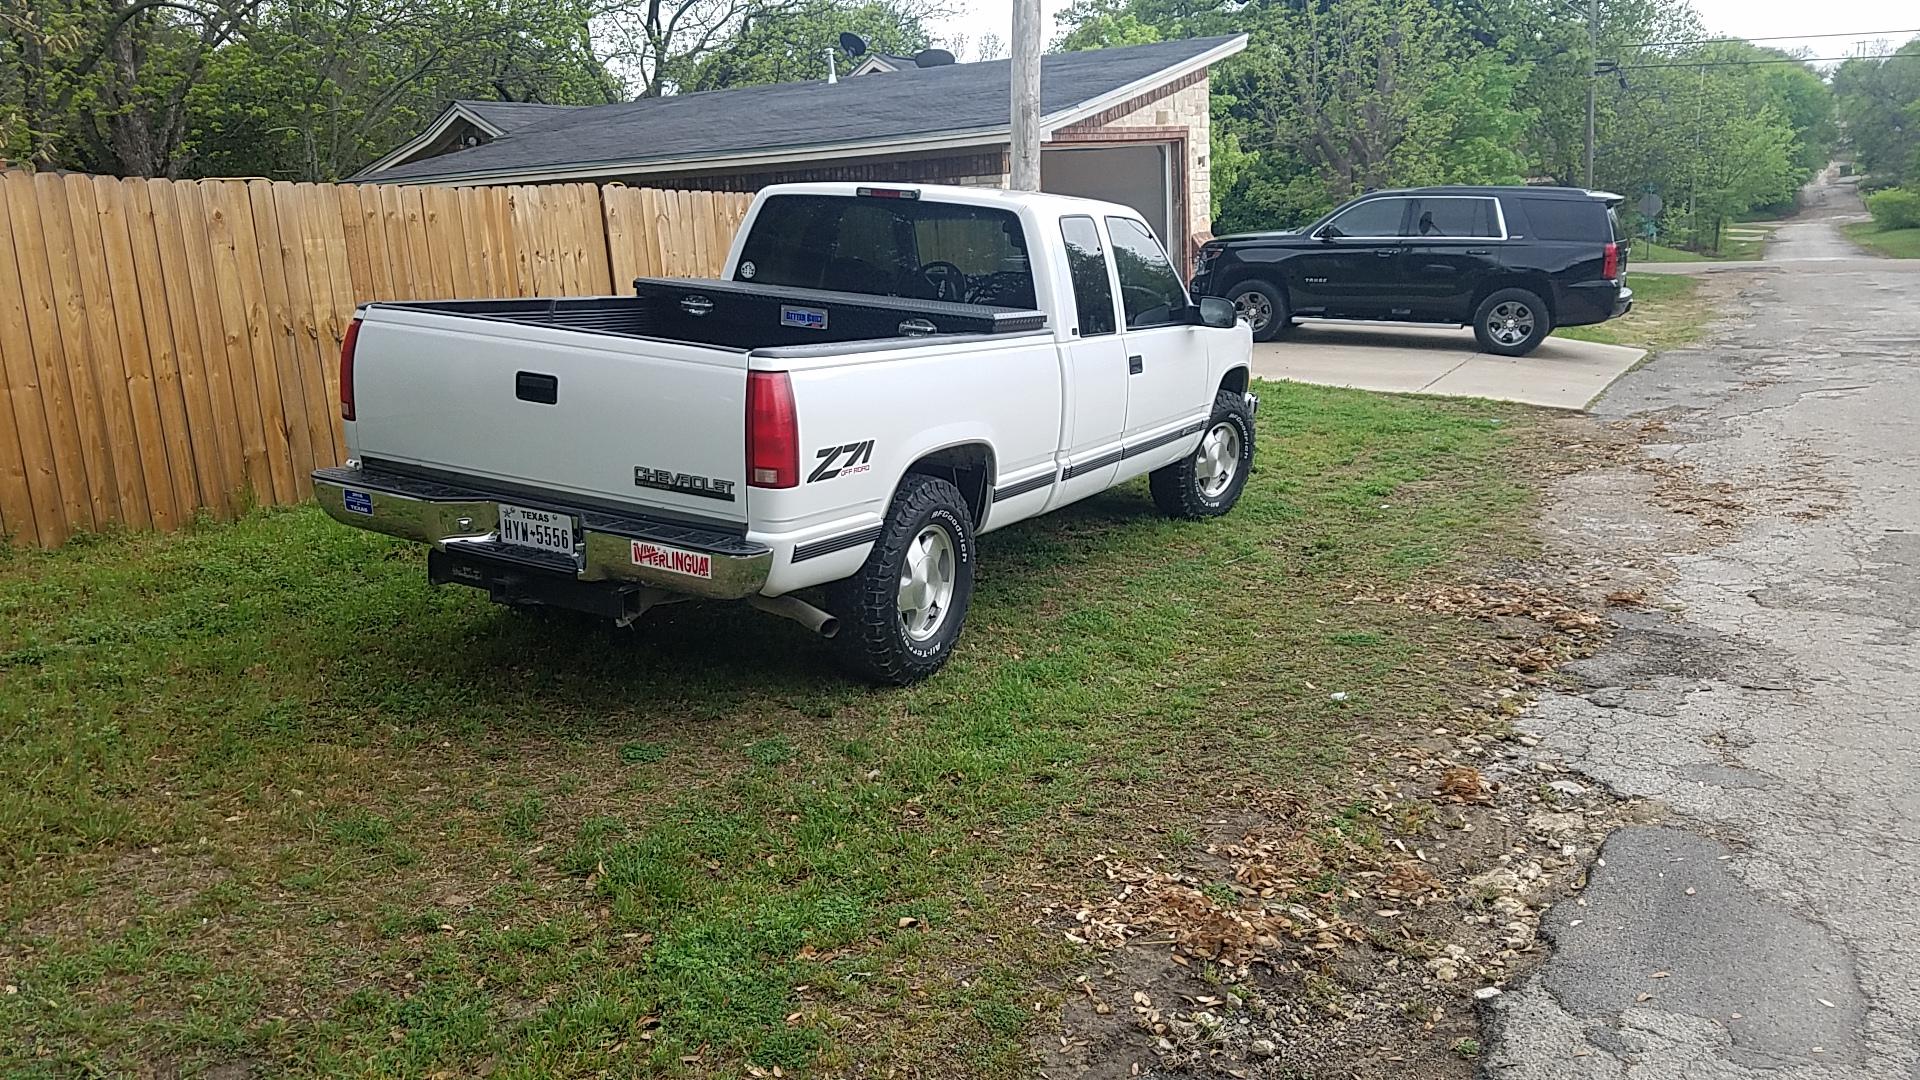 For Sale - TX: Chevrolet, K1500, Z71 | IH8MUD Forum